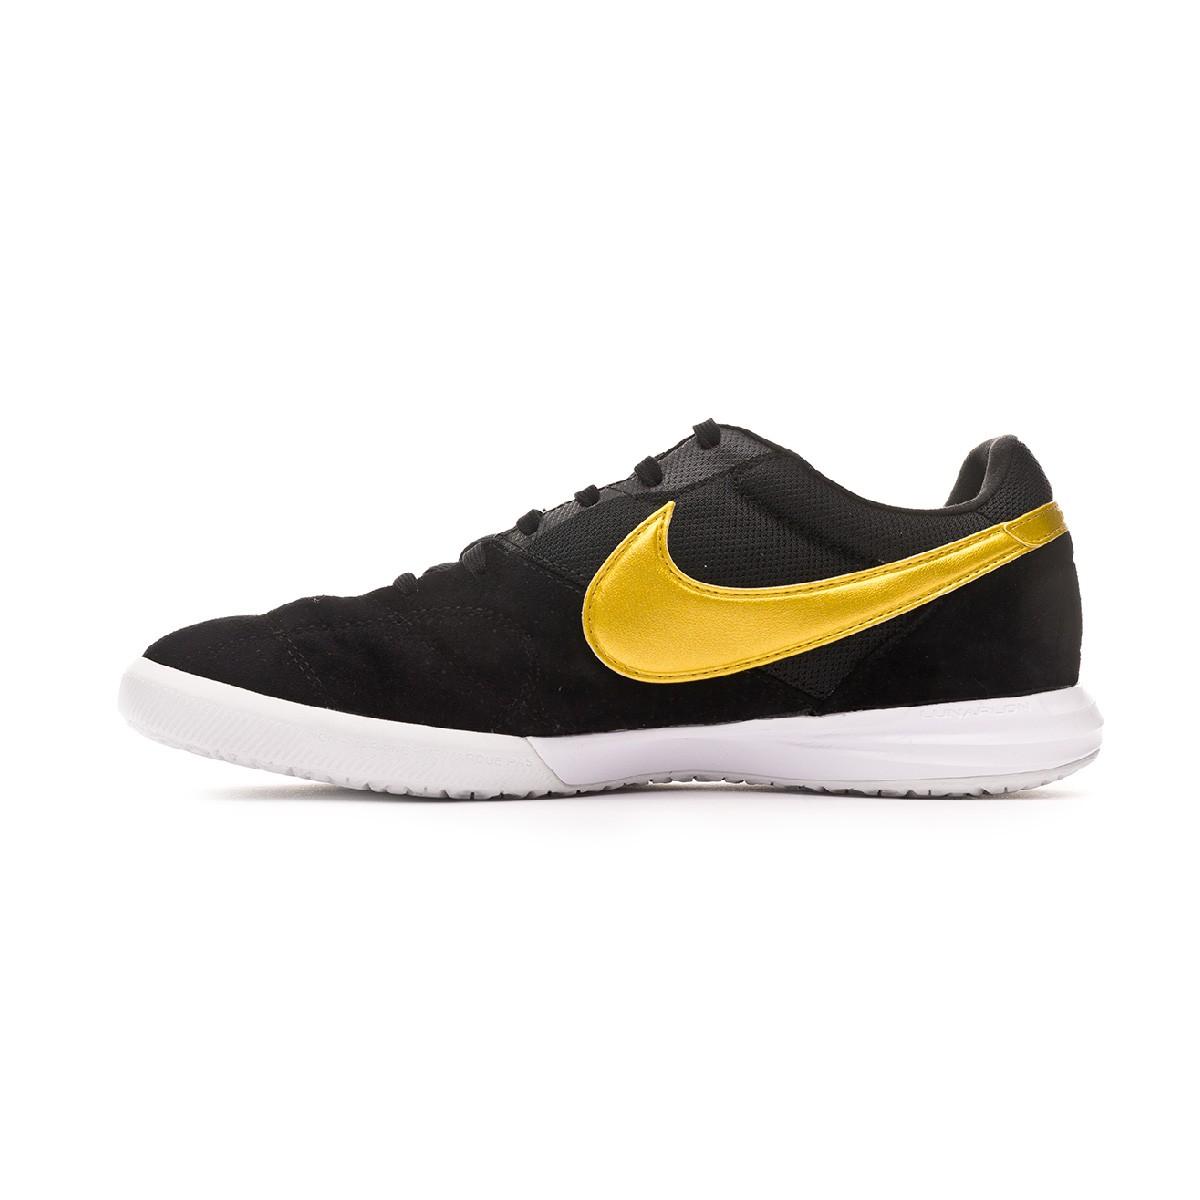 d9a5cbdae Futsal Boot Nike Tiempo Premier II Sala IC Black-Metallic vivid gold-White  - Football store Fútbol Emotion